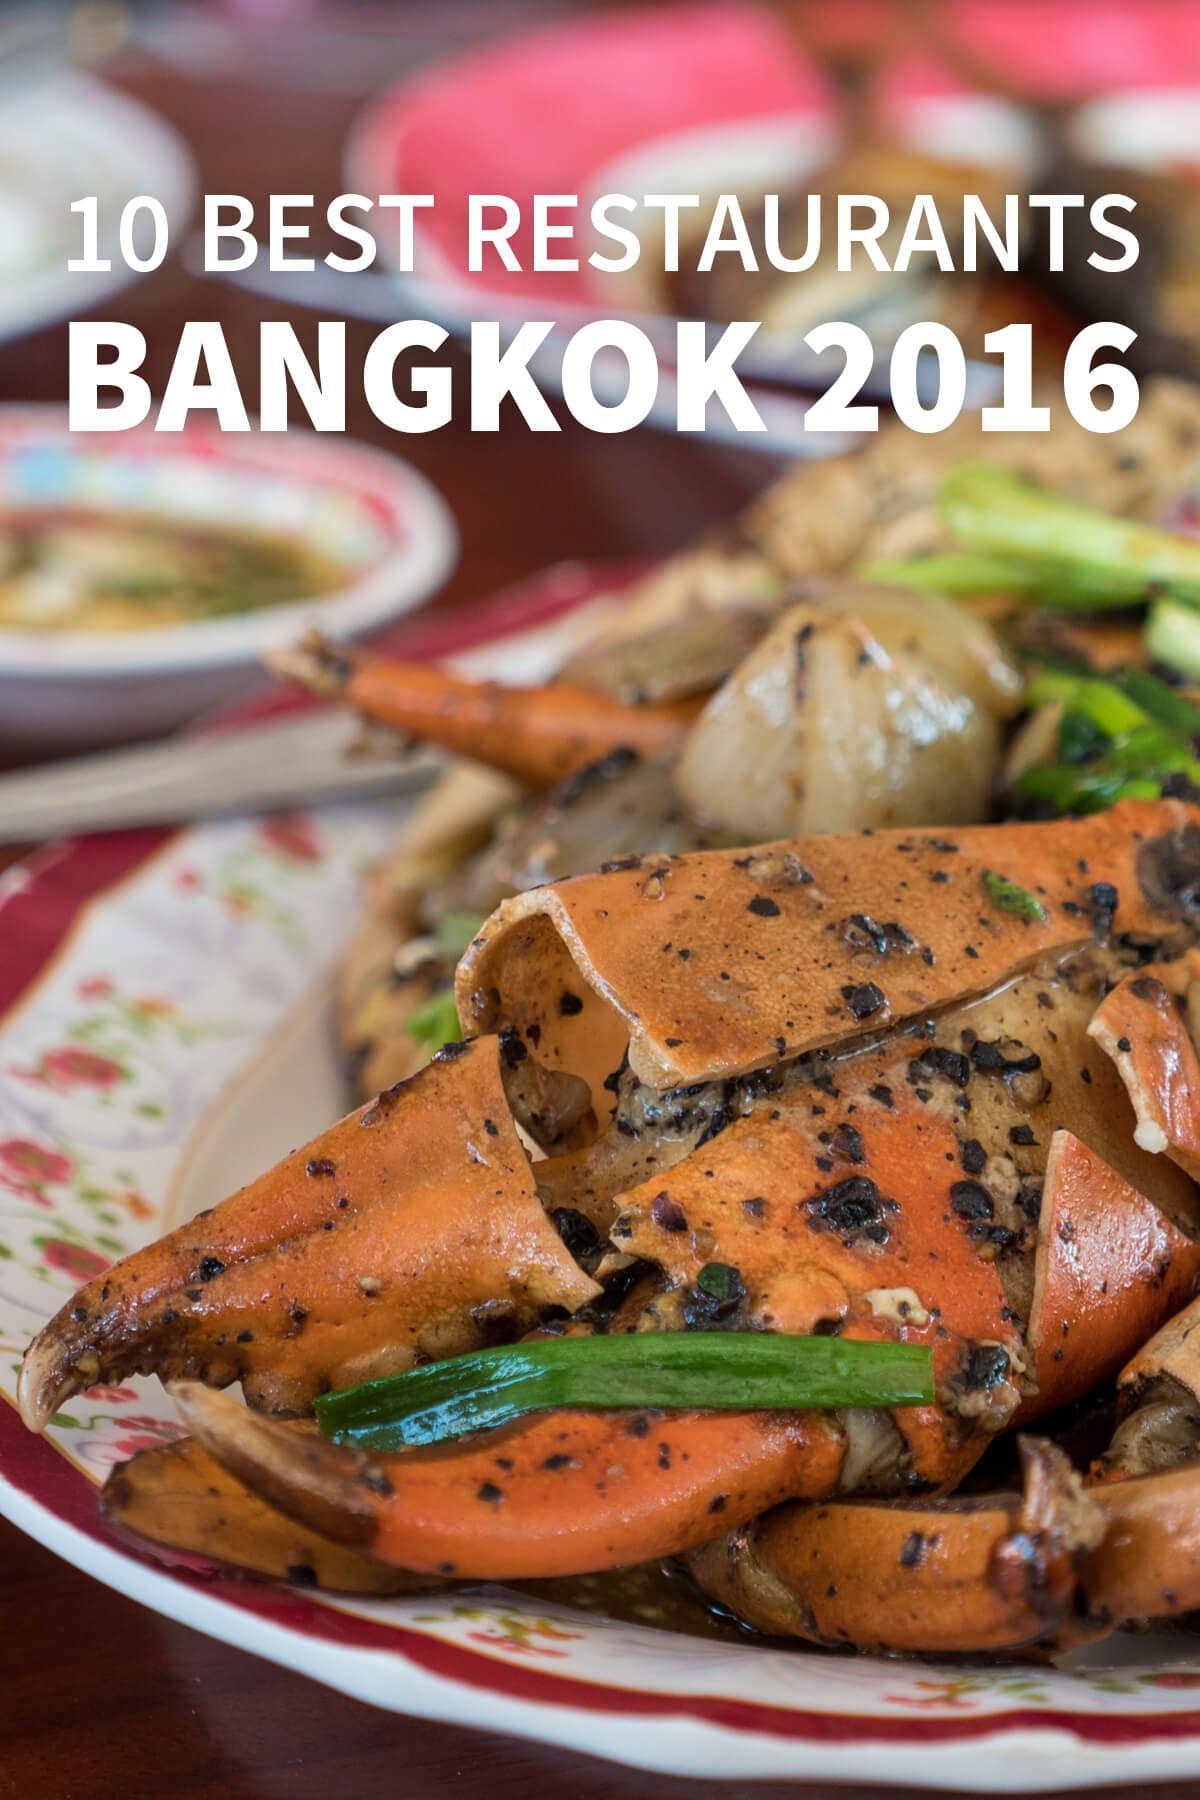 The 10 Best Thai Restaurants In Bangkok In 2016 Best Thai Food Best Thai Restaurant Bangkok Food